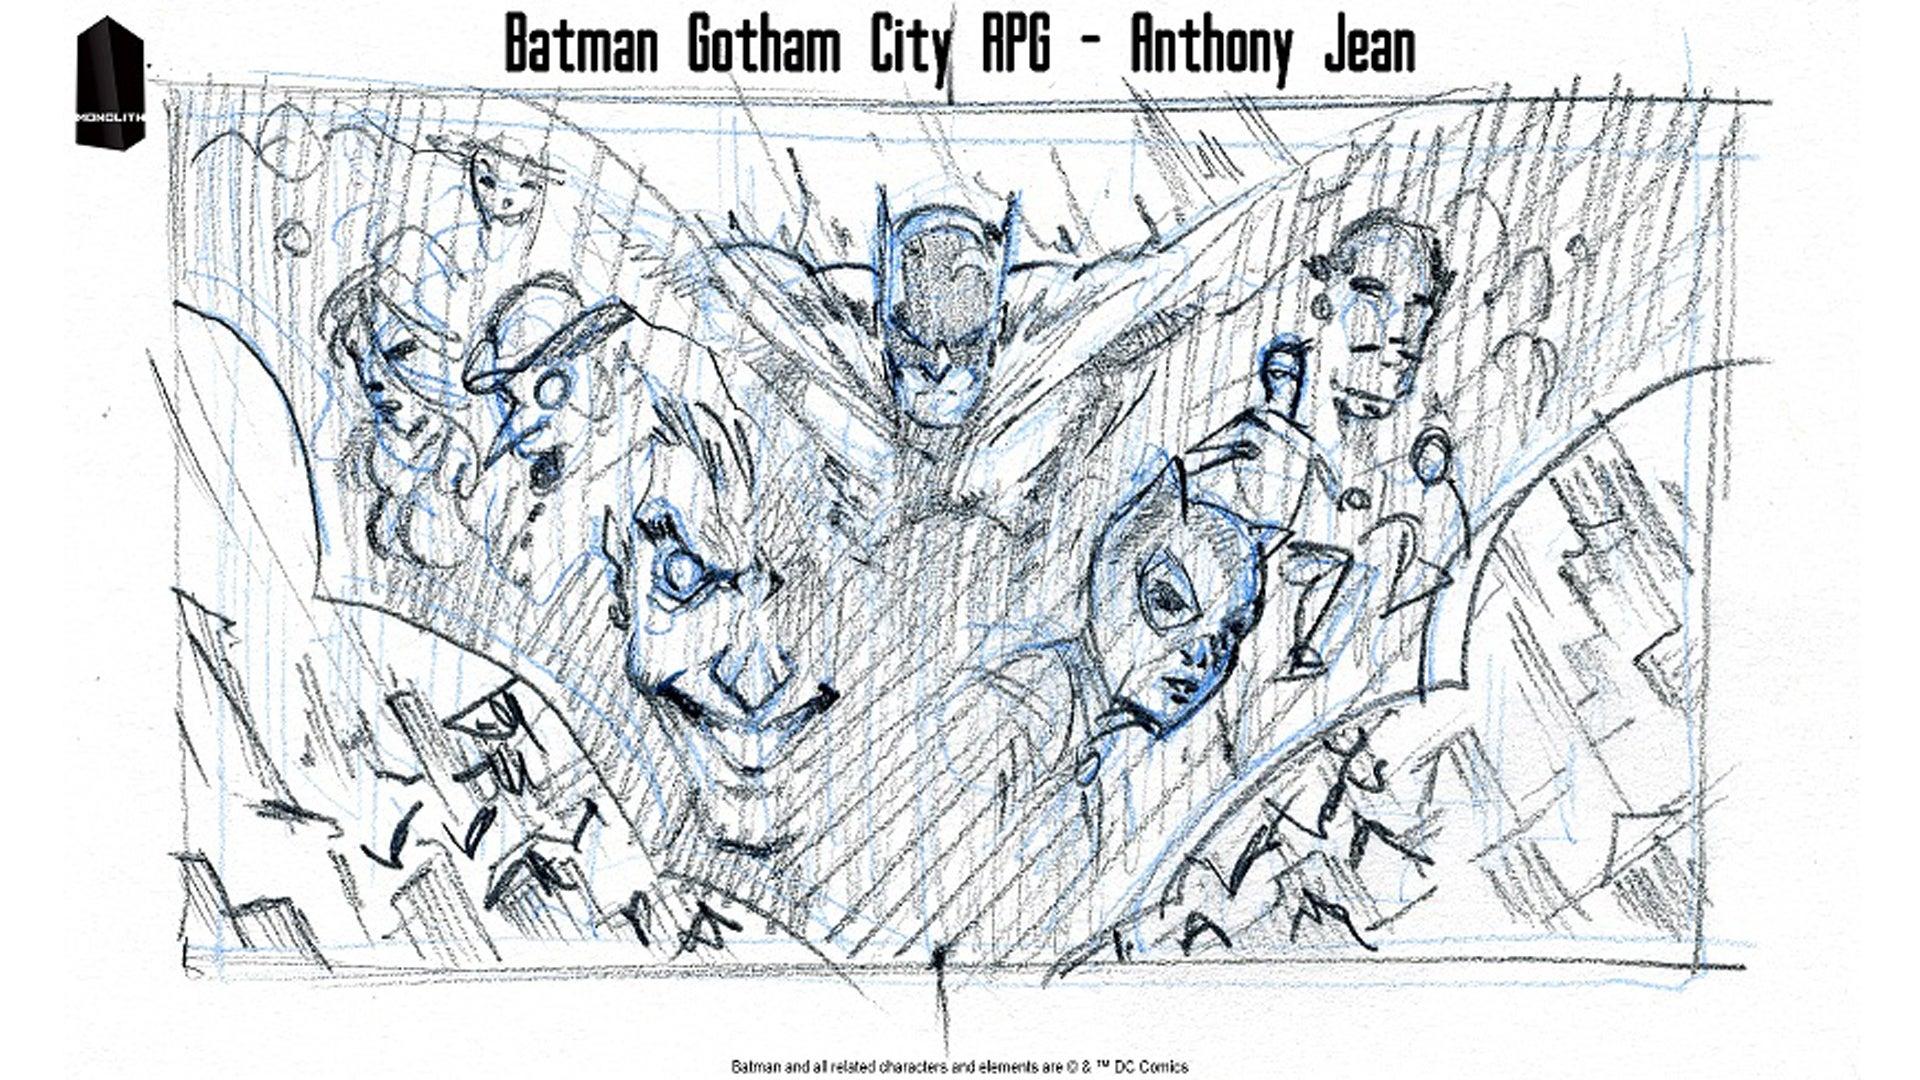 batman-gotham-city-chronicles-rpg-cover-art-draft.jpg